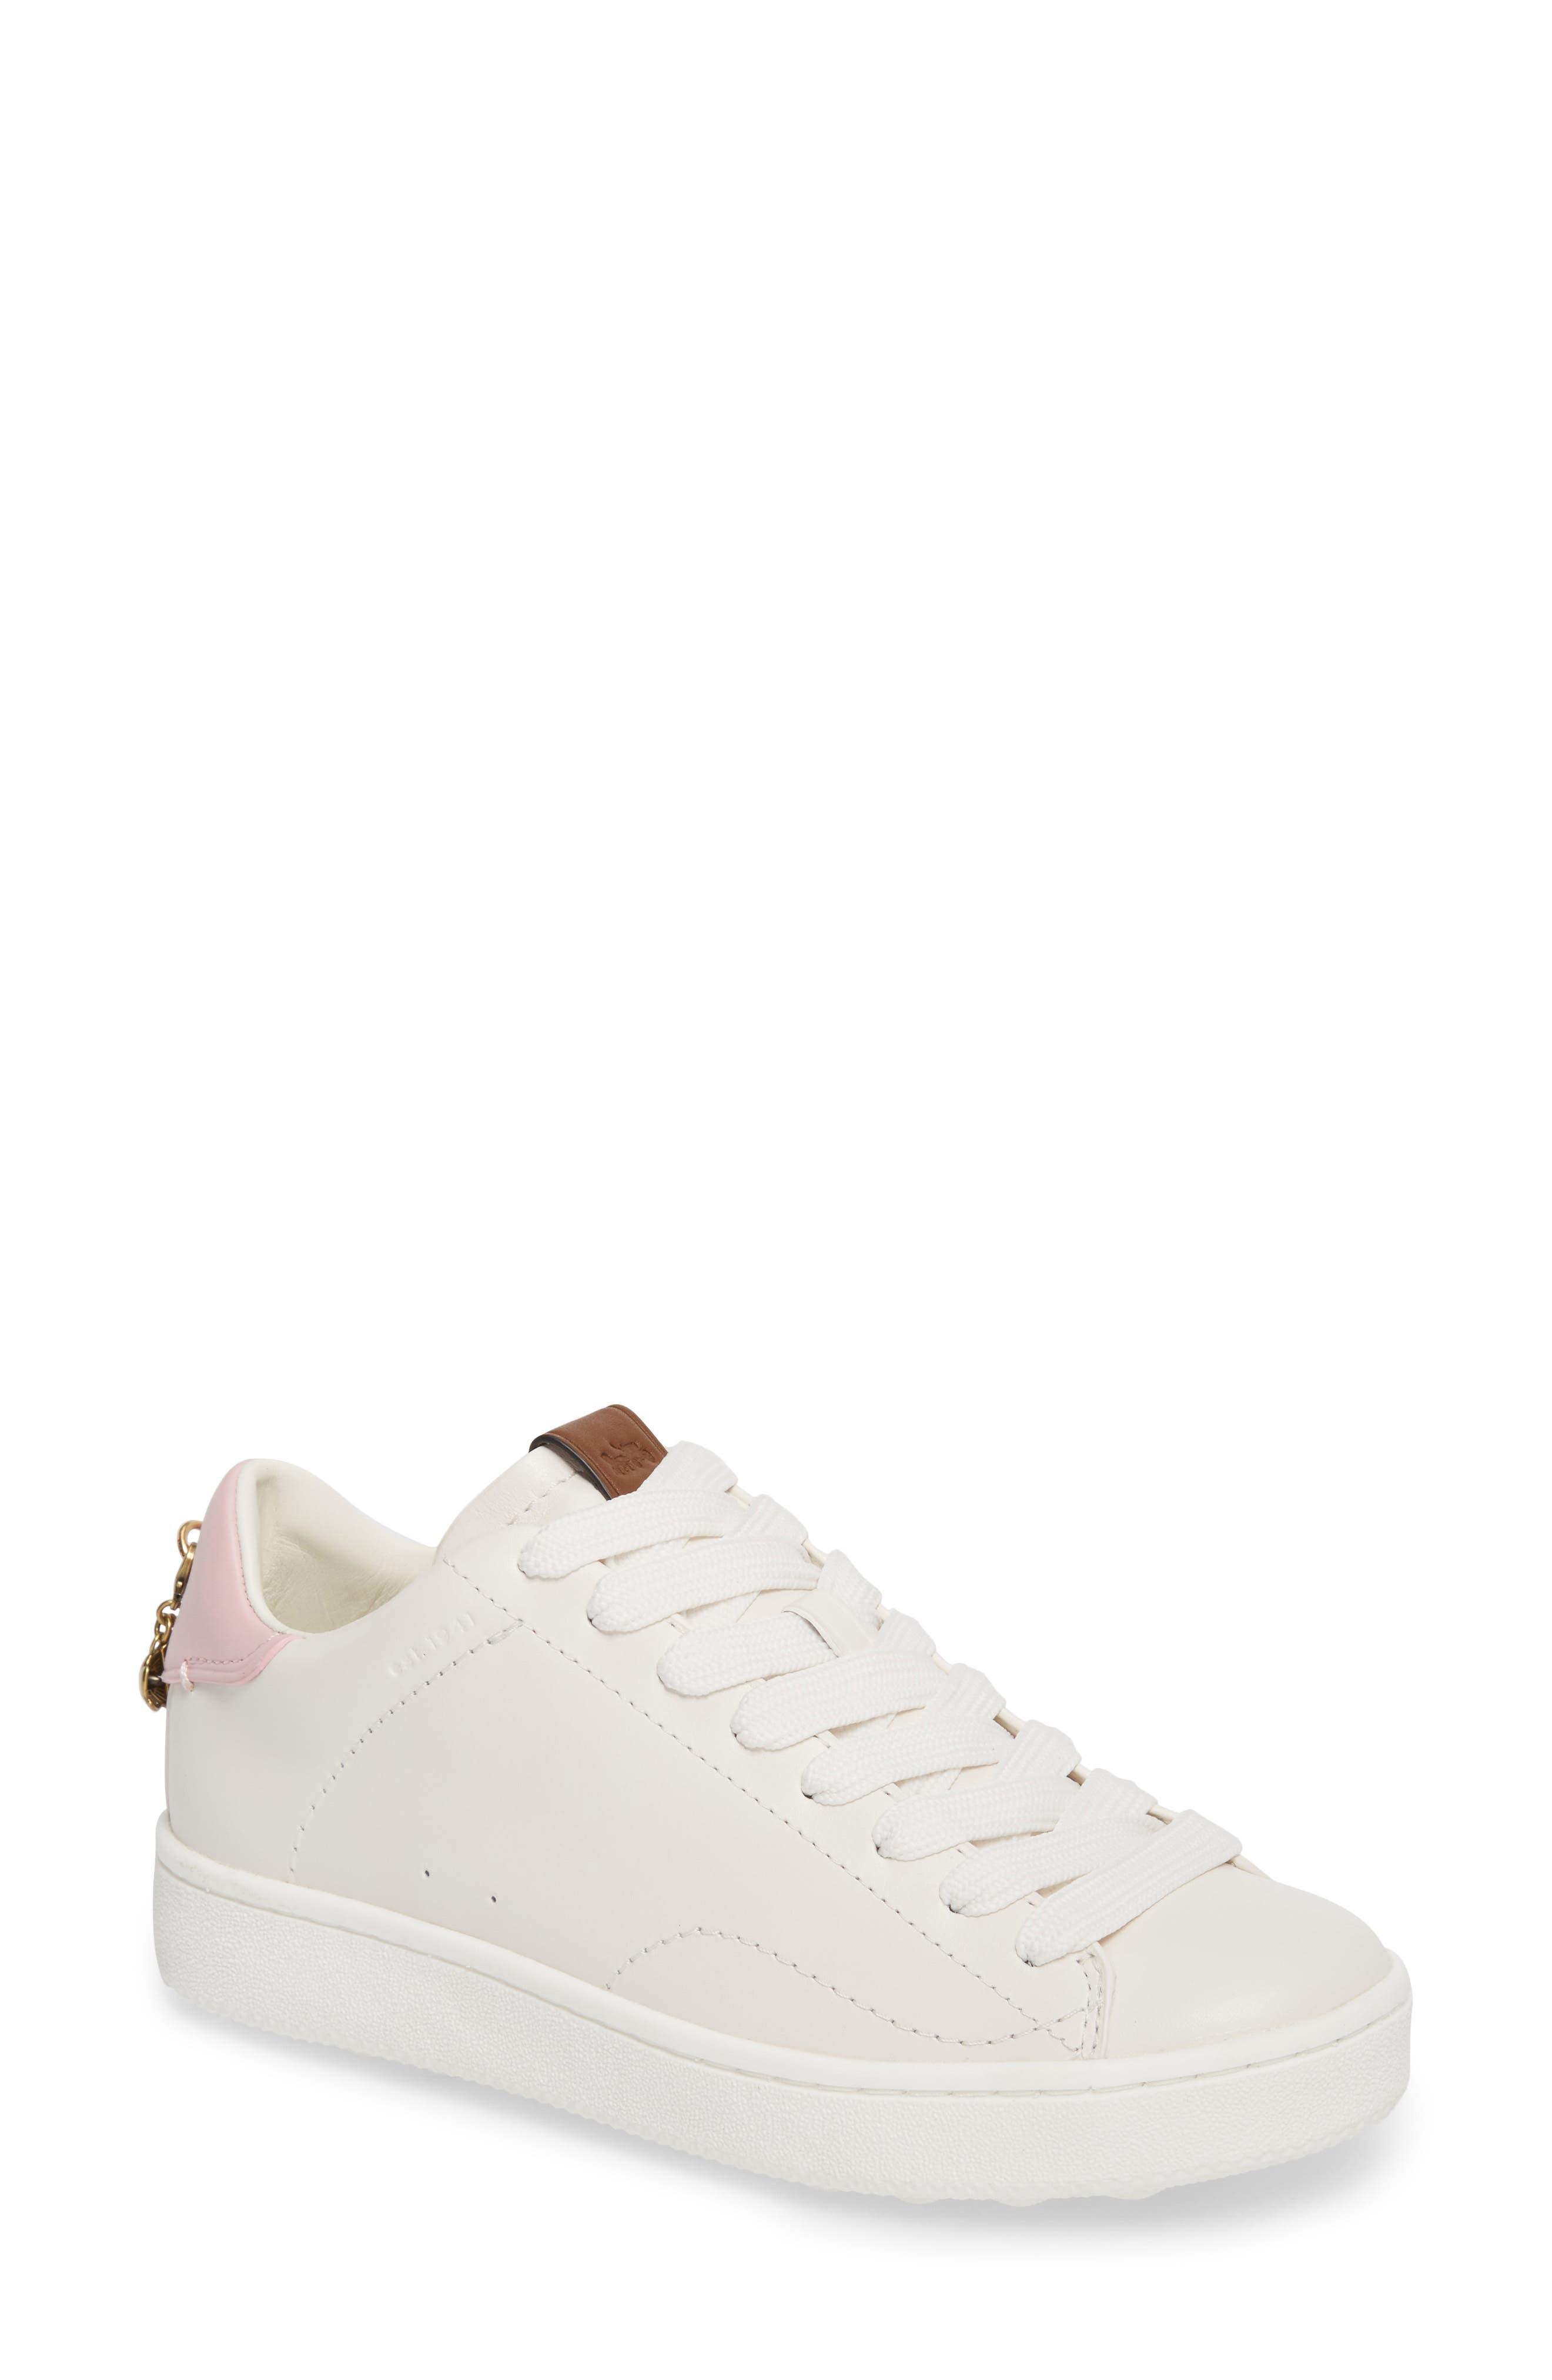 COACH, Sneaker, Main thumbnail 1, color, WHITE/ PETAL LEATHER